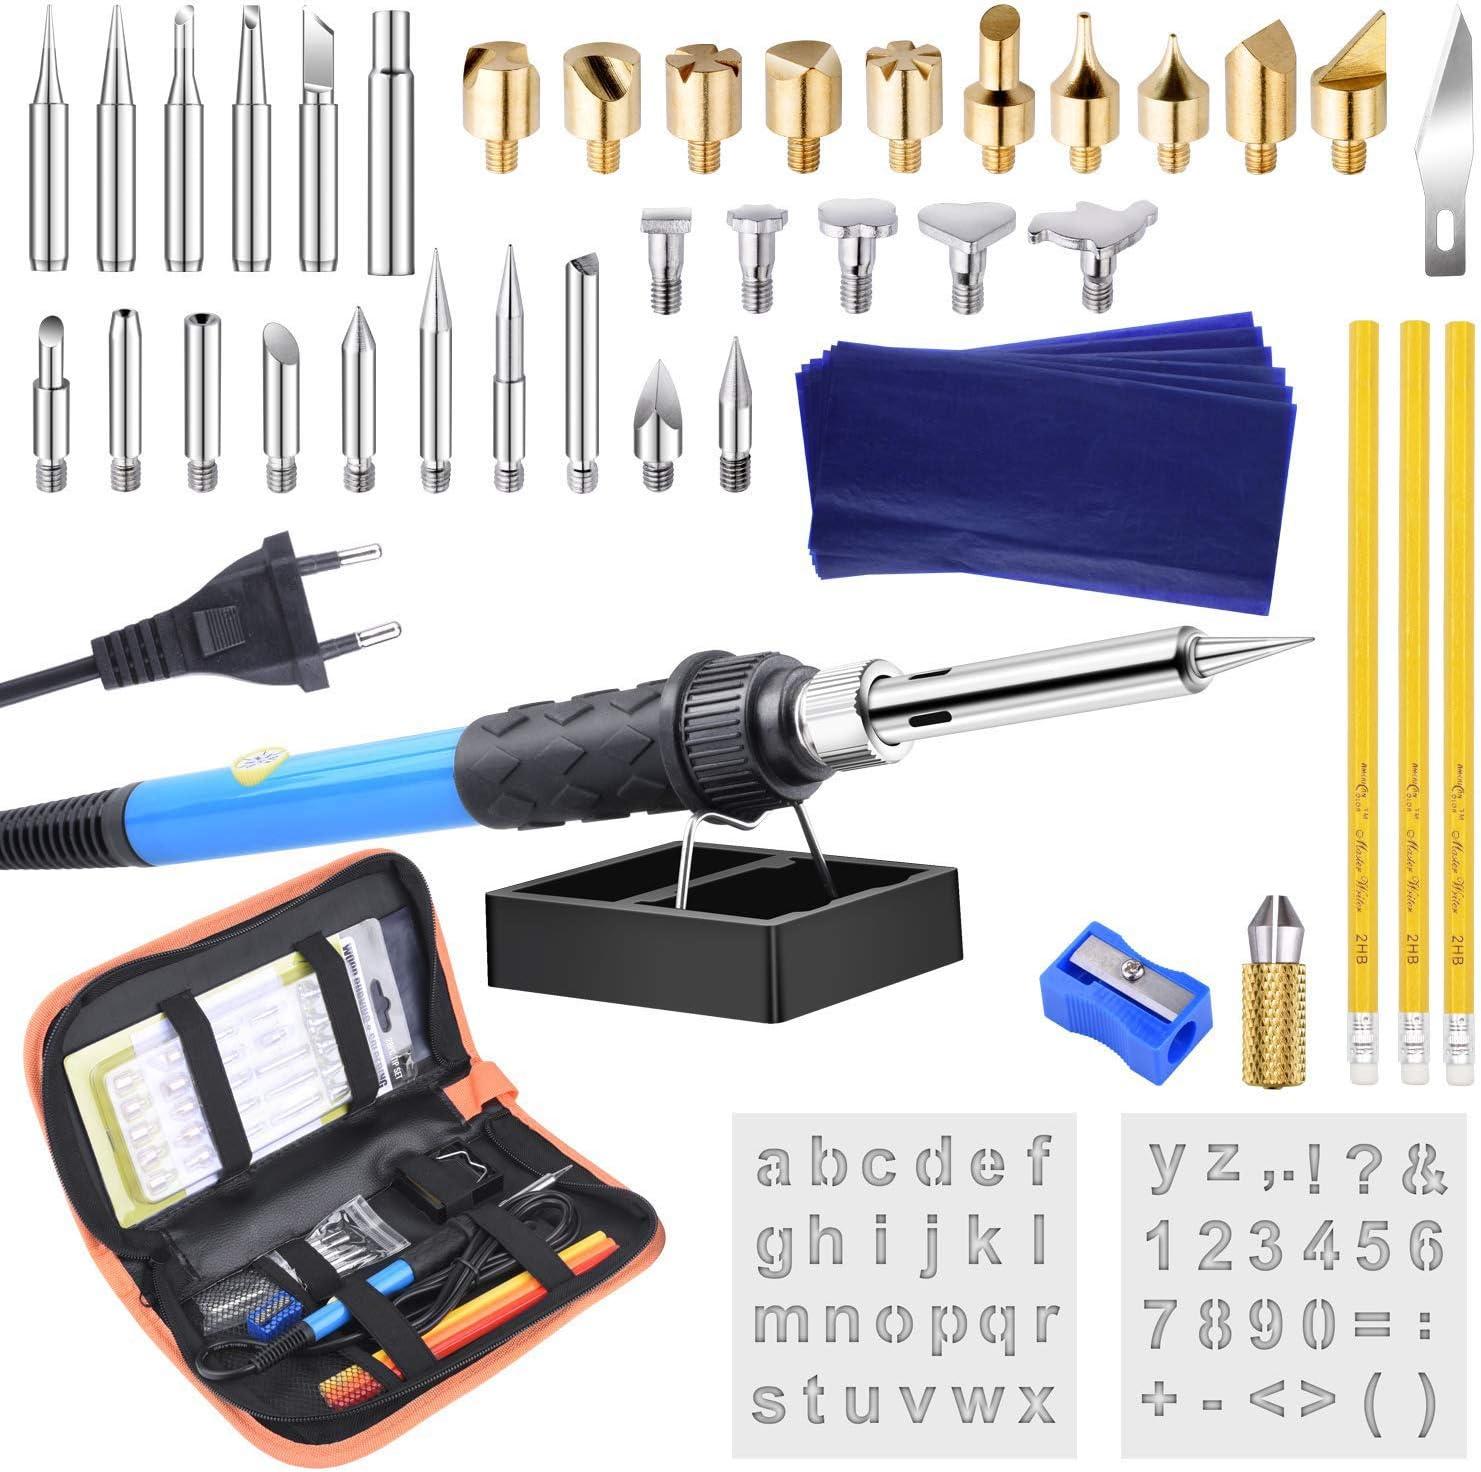 discount MOHANBTO 48PCs Pyrography Soldering Iron Pen online shopping f Burning Set Tool